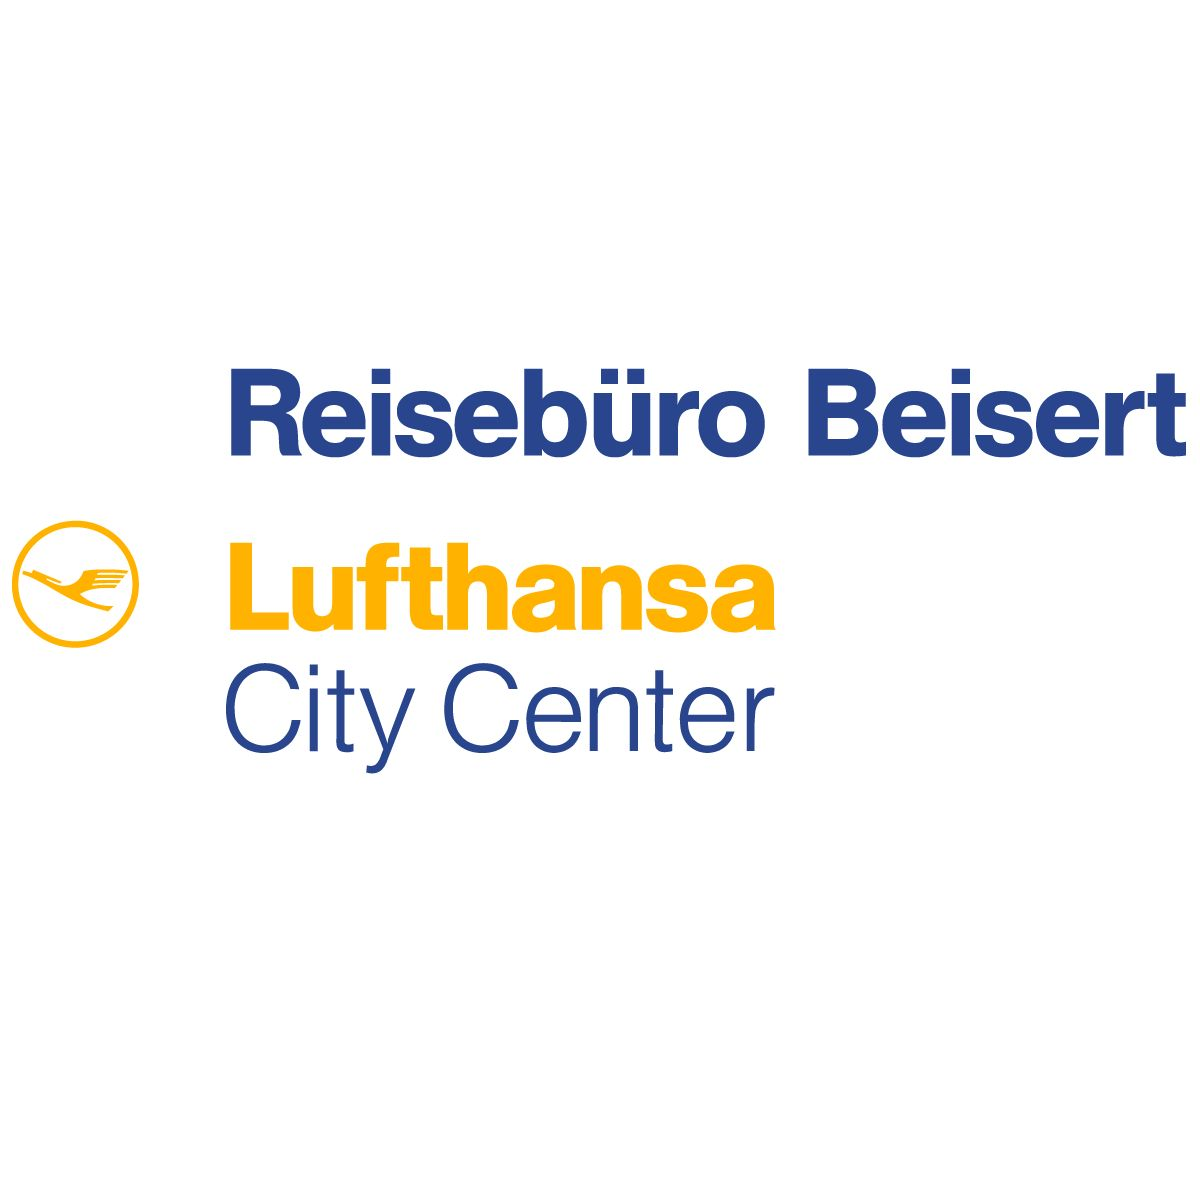 Reisebüro Beisert GmbH Lufthansa City Center Logo